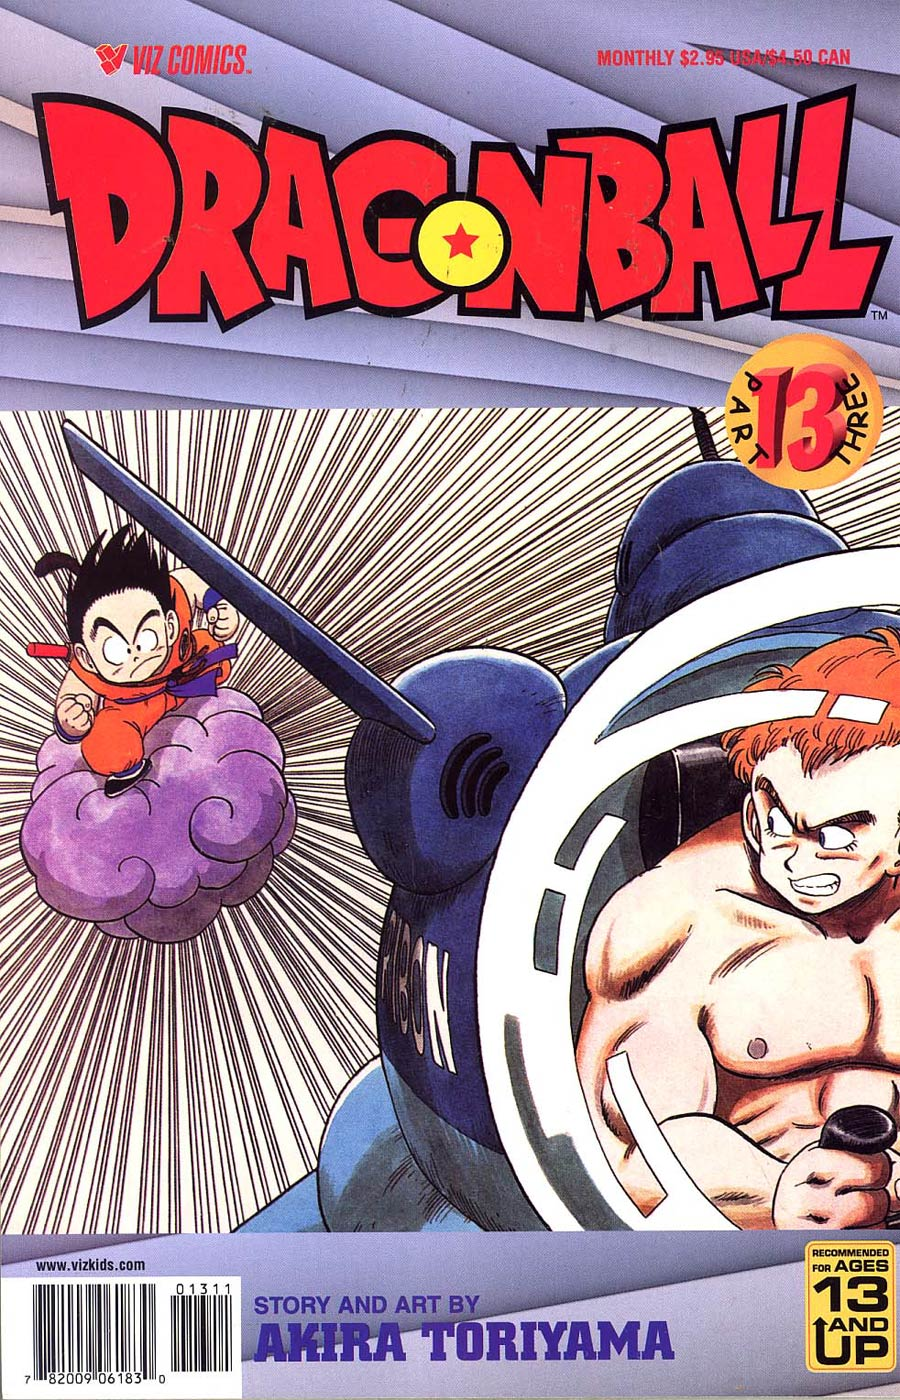 Dragon Ball Part 3 #13